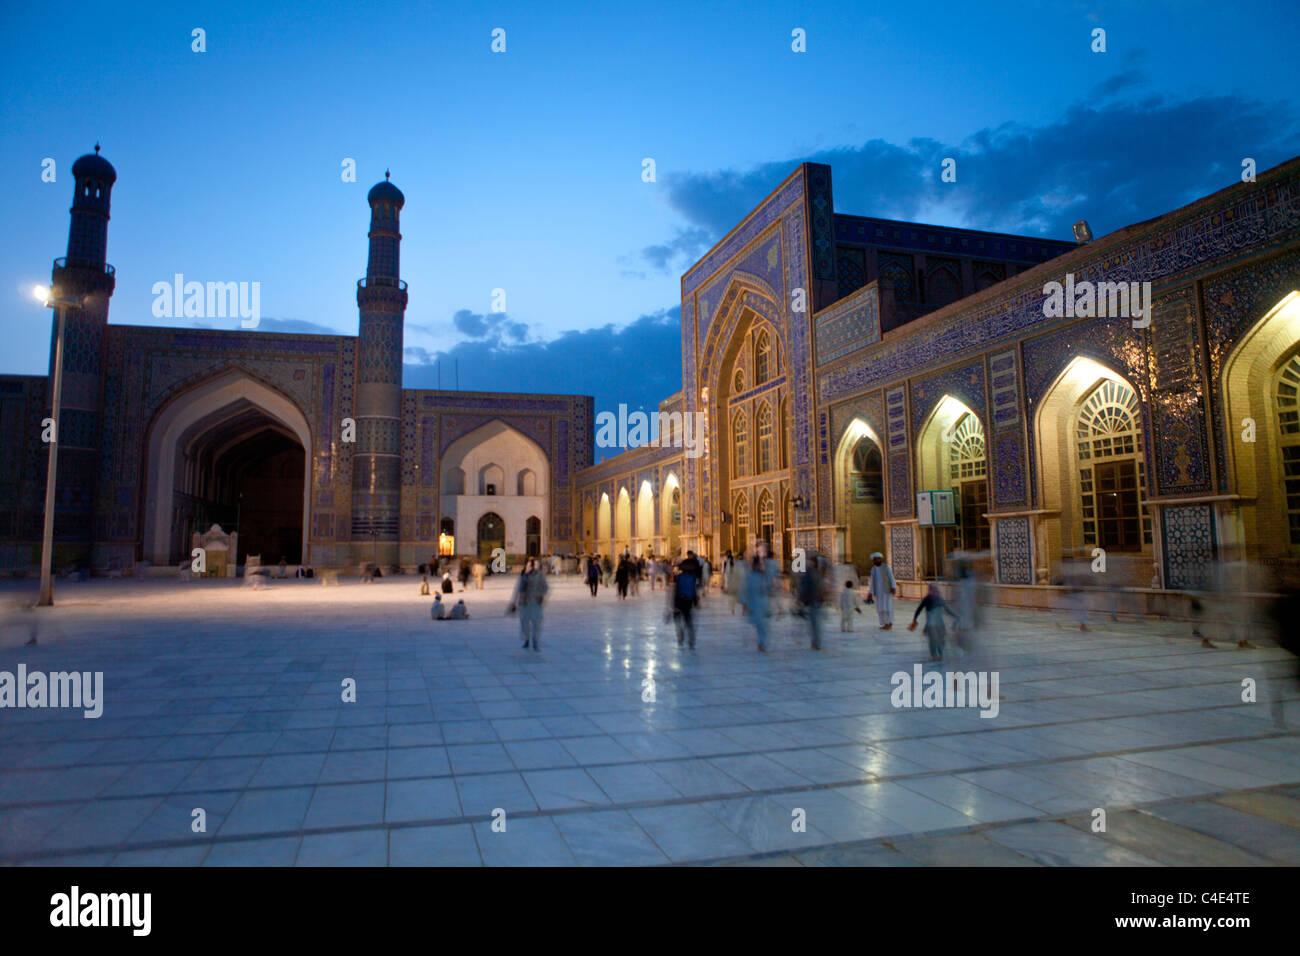 Image Result For Islam Holy Citya